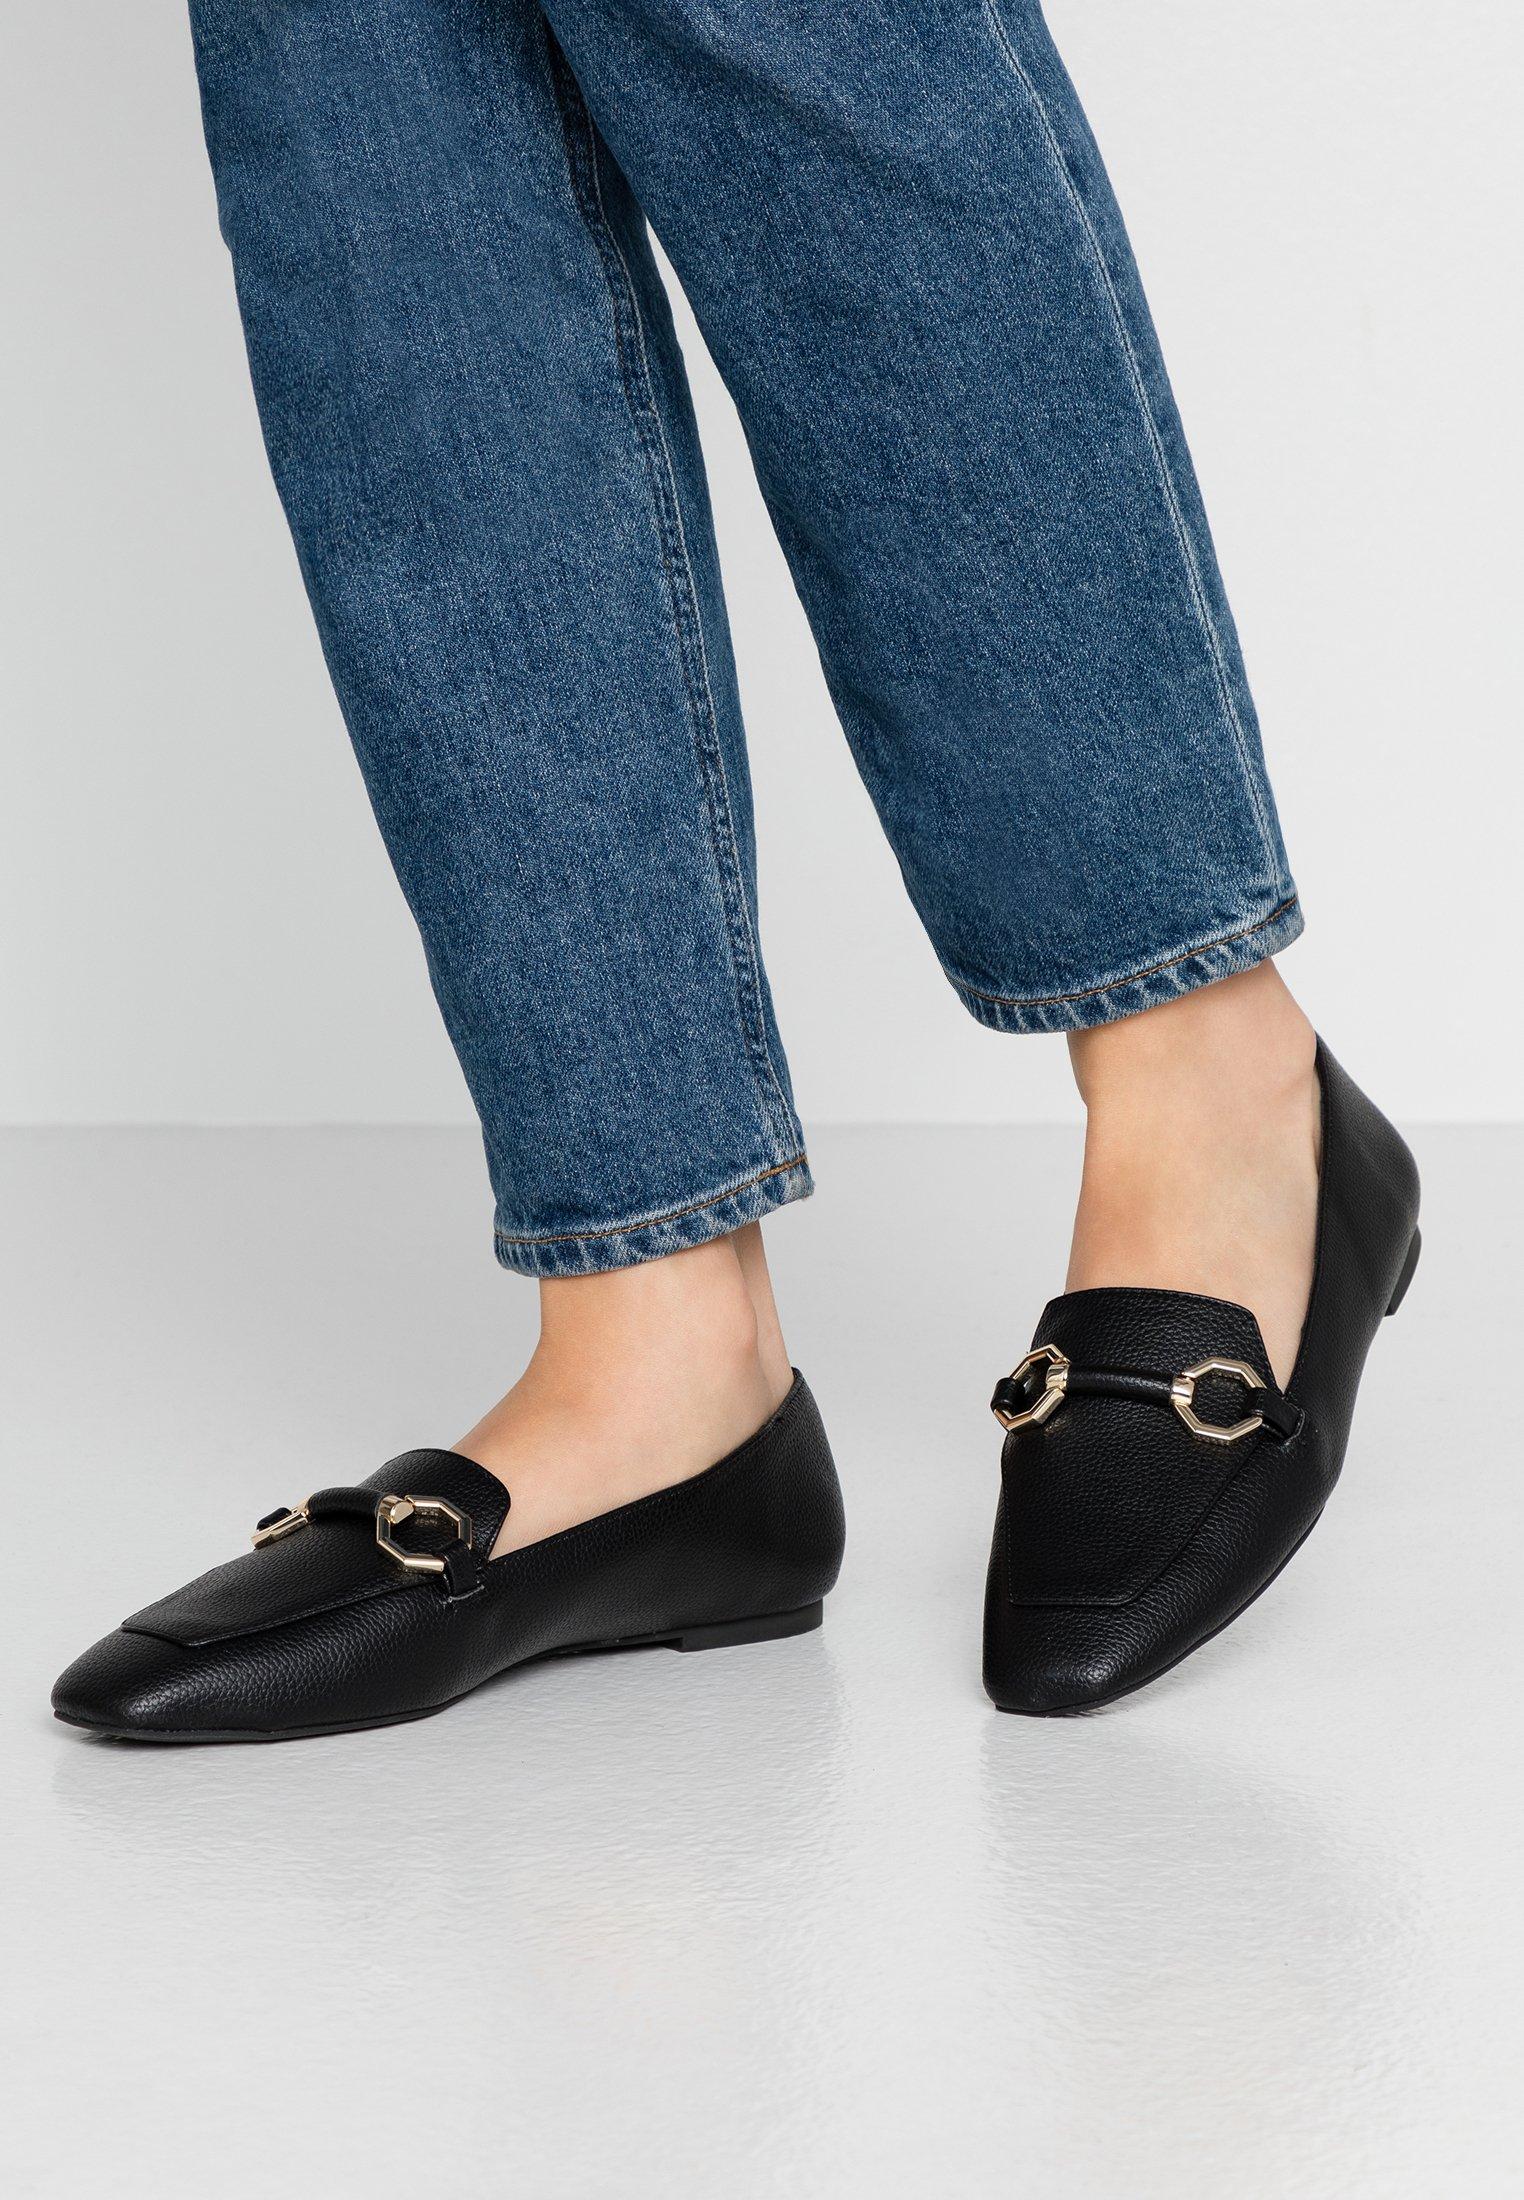 PARFOIS Scarpe senza lacci black